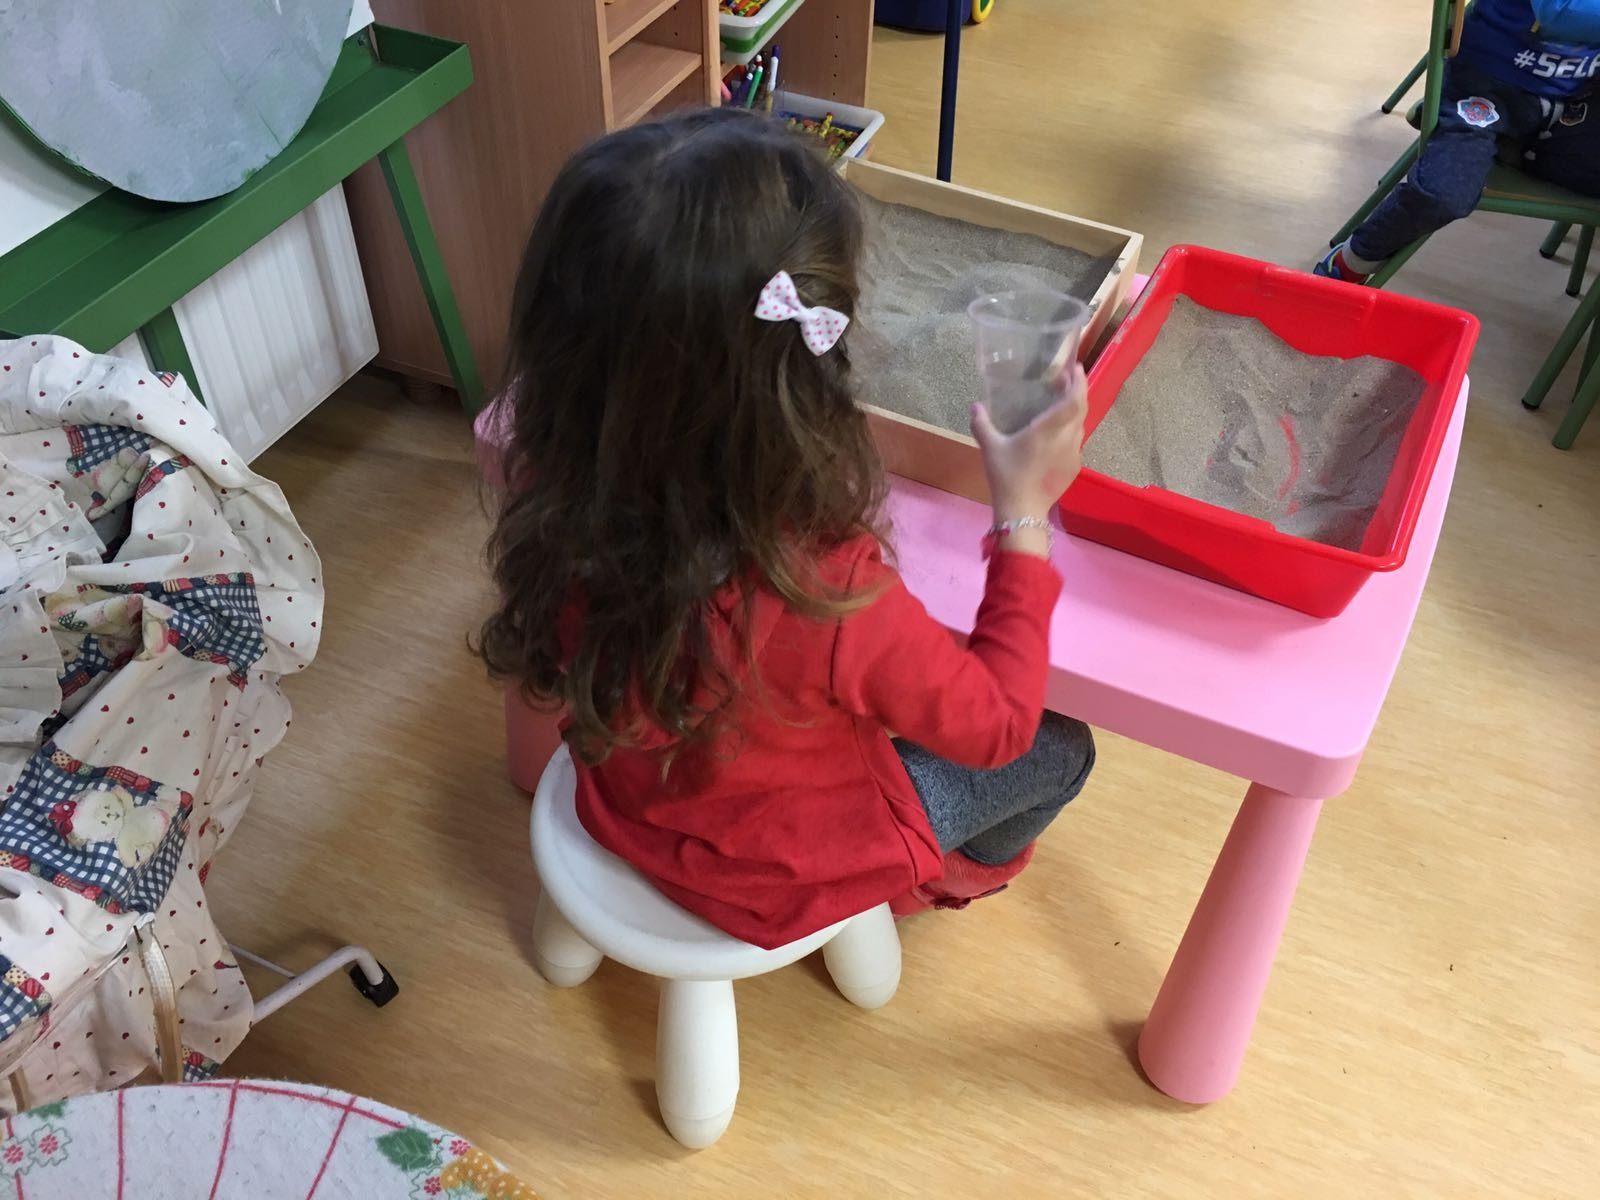 E. Infantil y sus proyectos 8